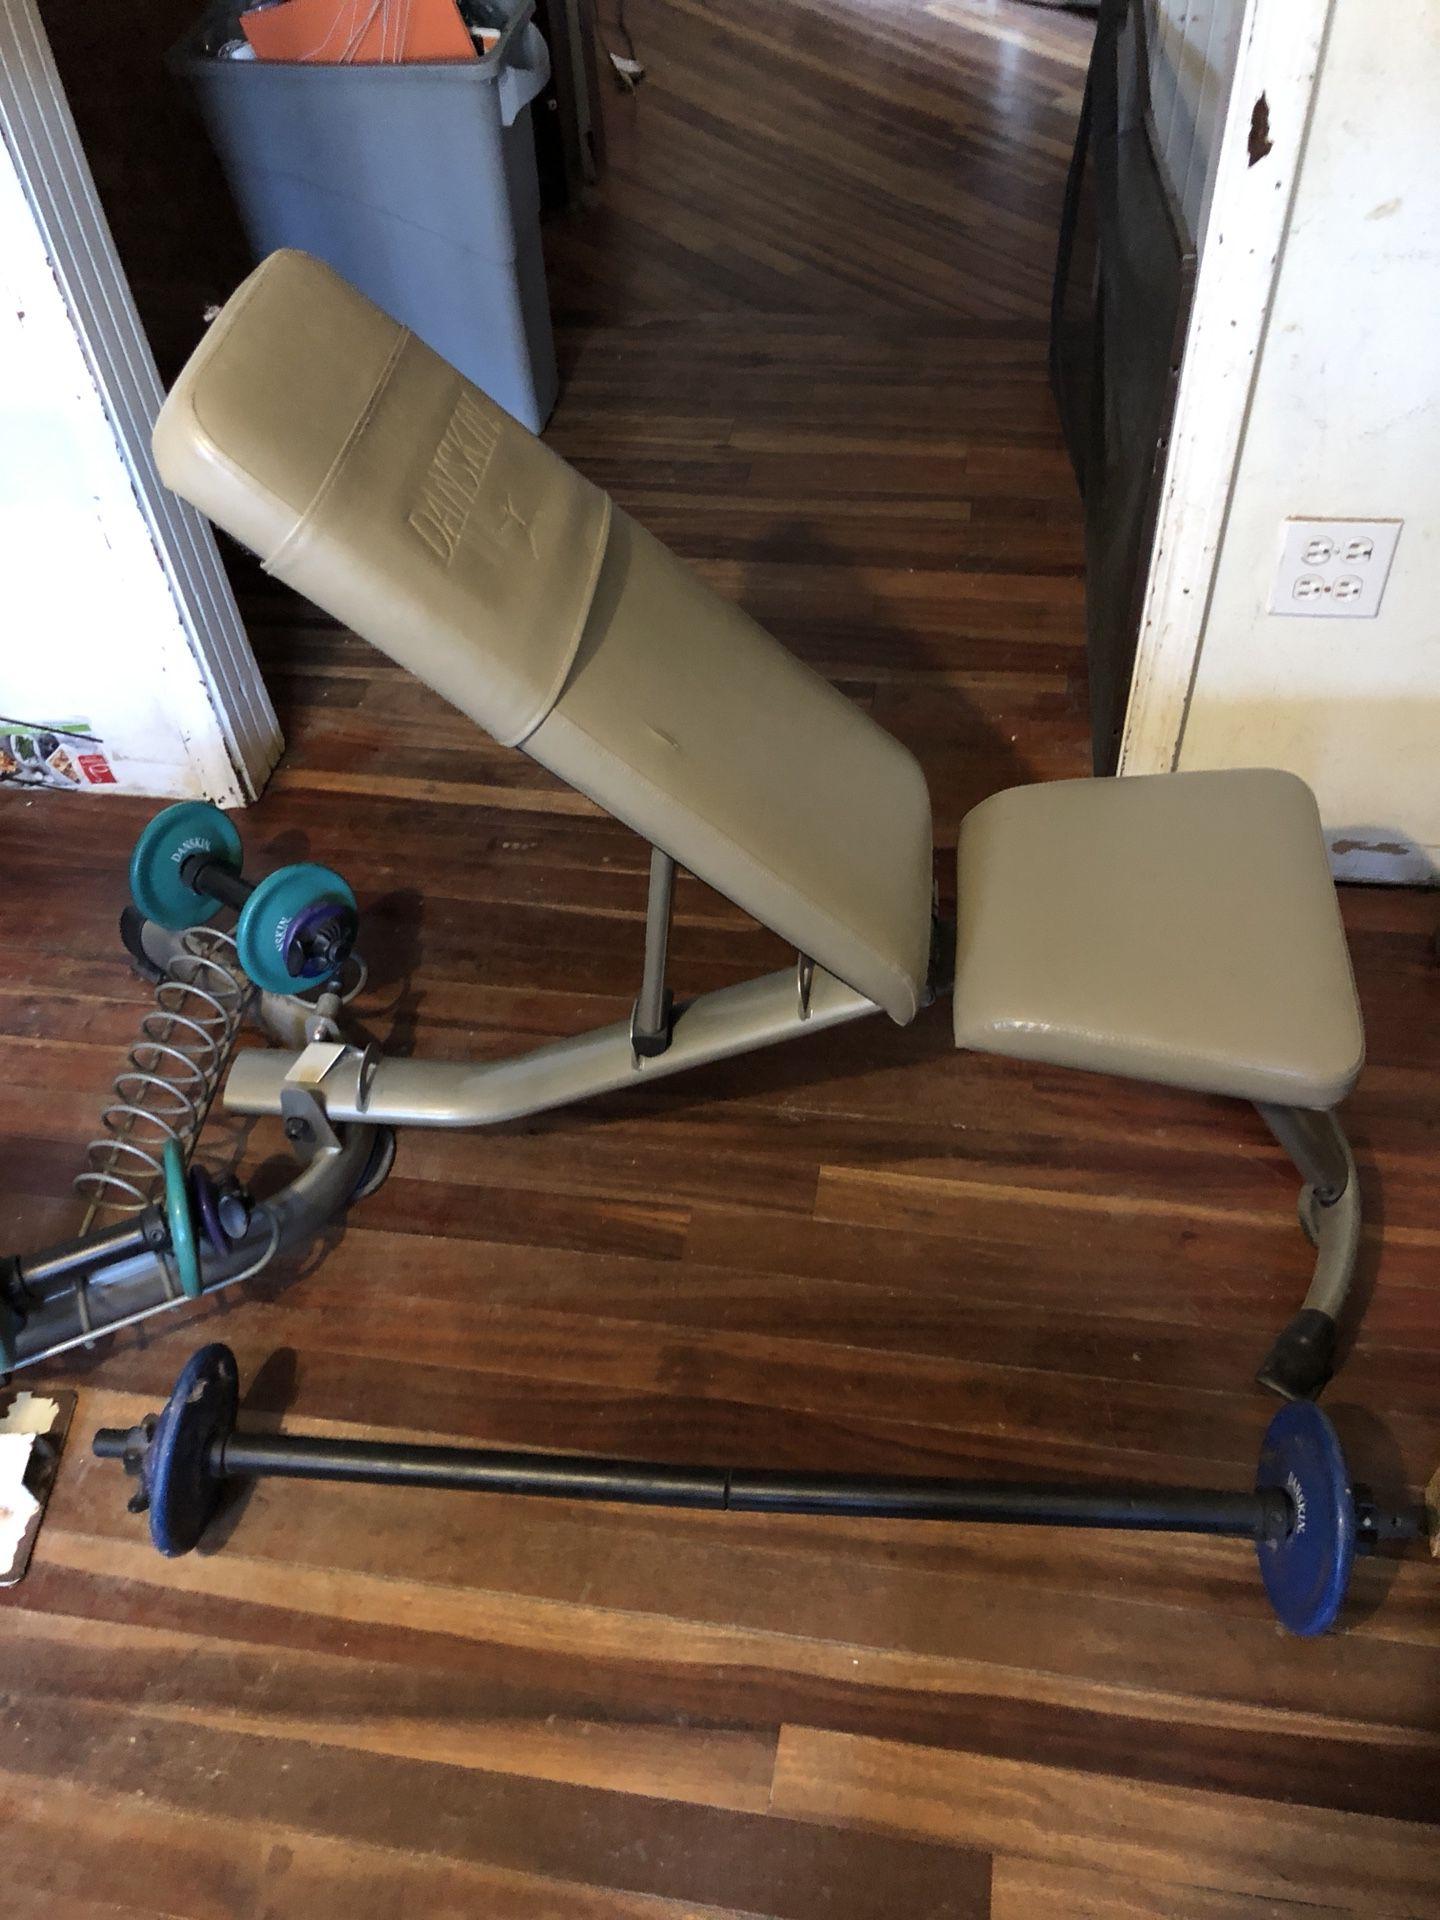 Danskin women's space saver folding adjustable weight bench